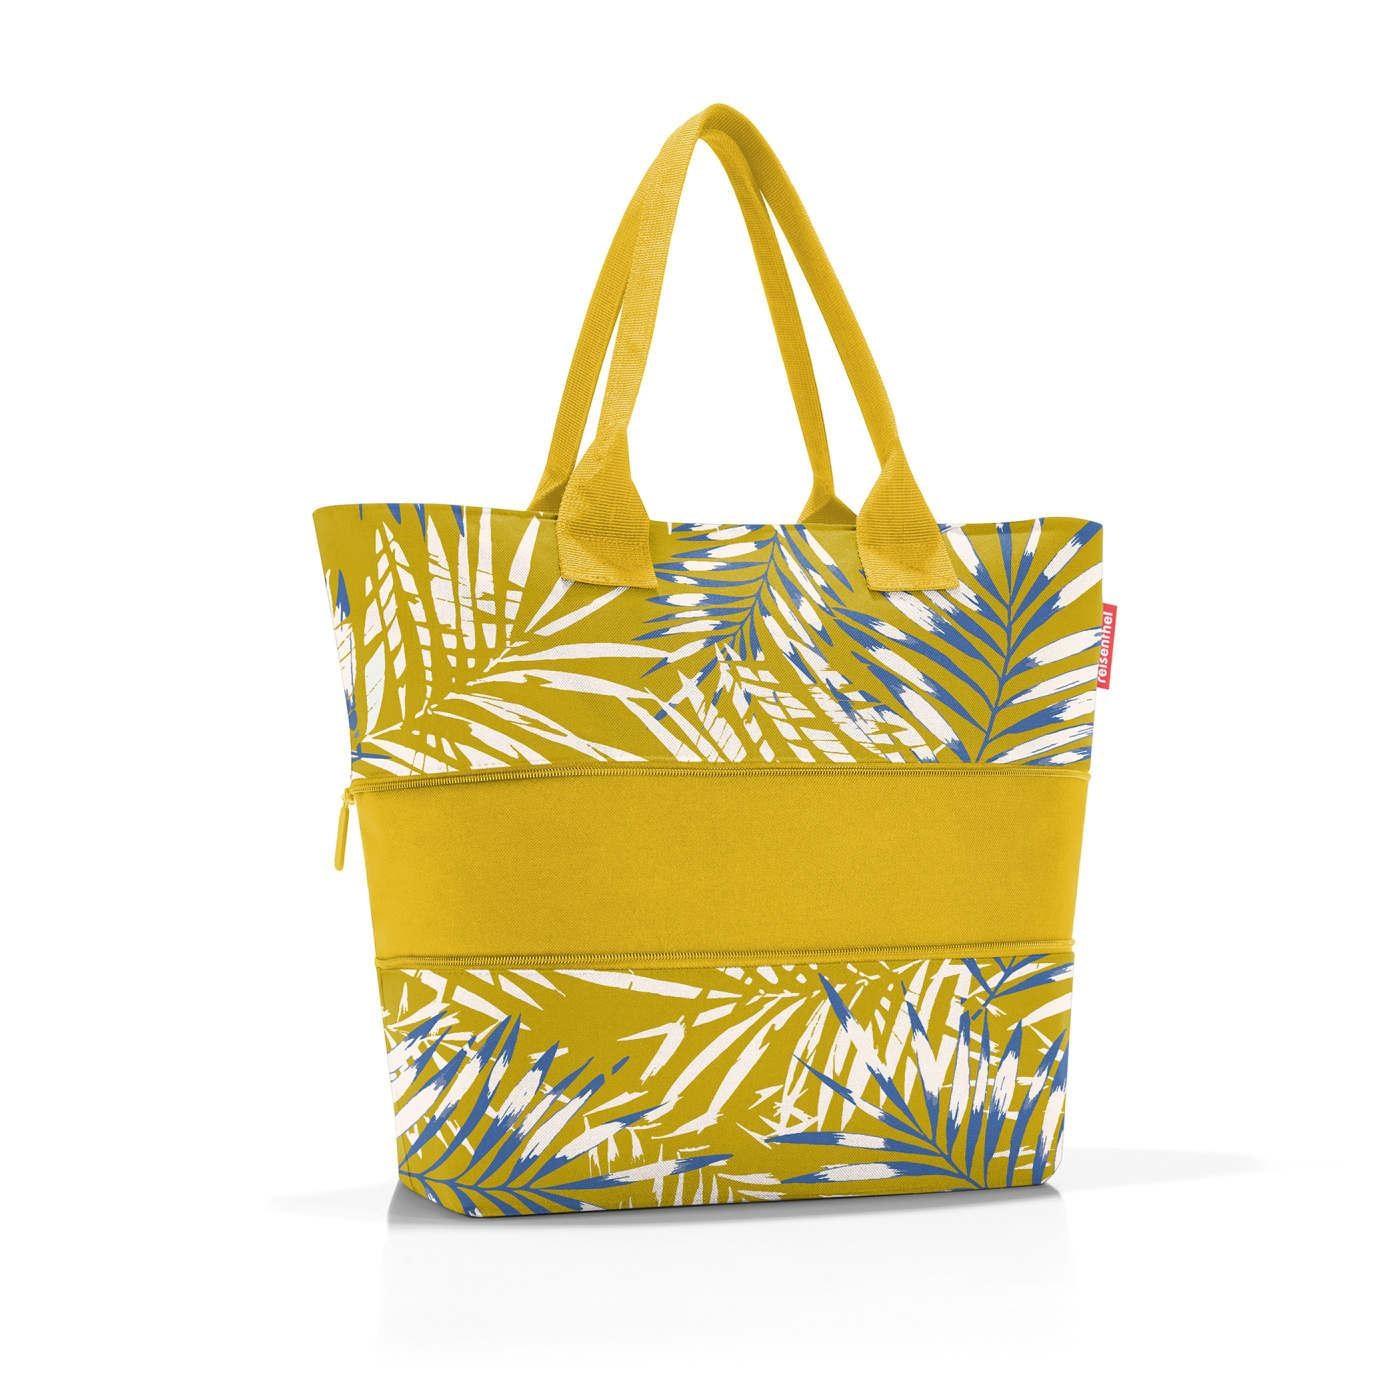 Chytrá taška přes rameno Shopper e1 jungle curry_1